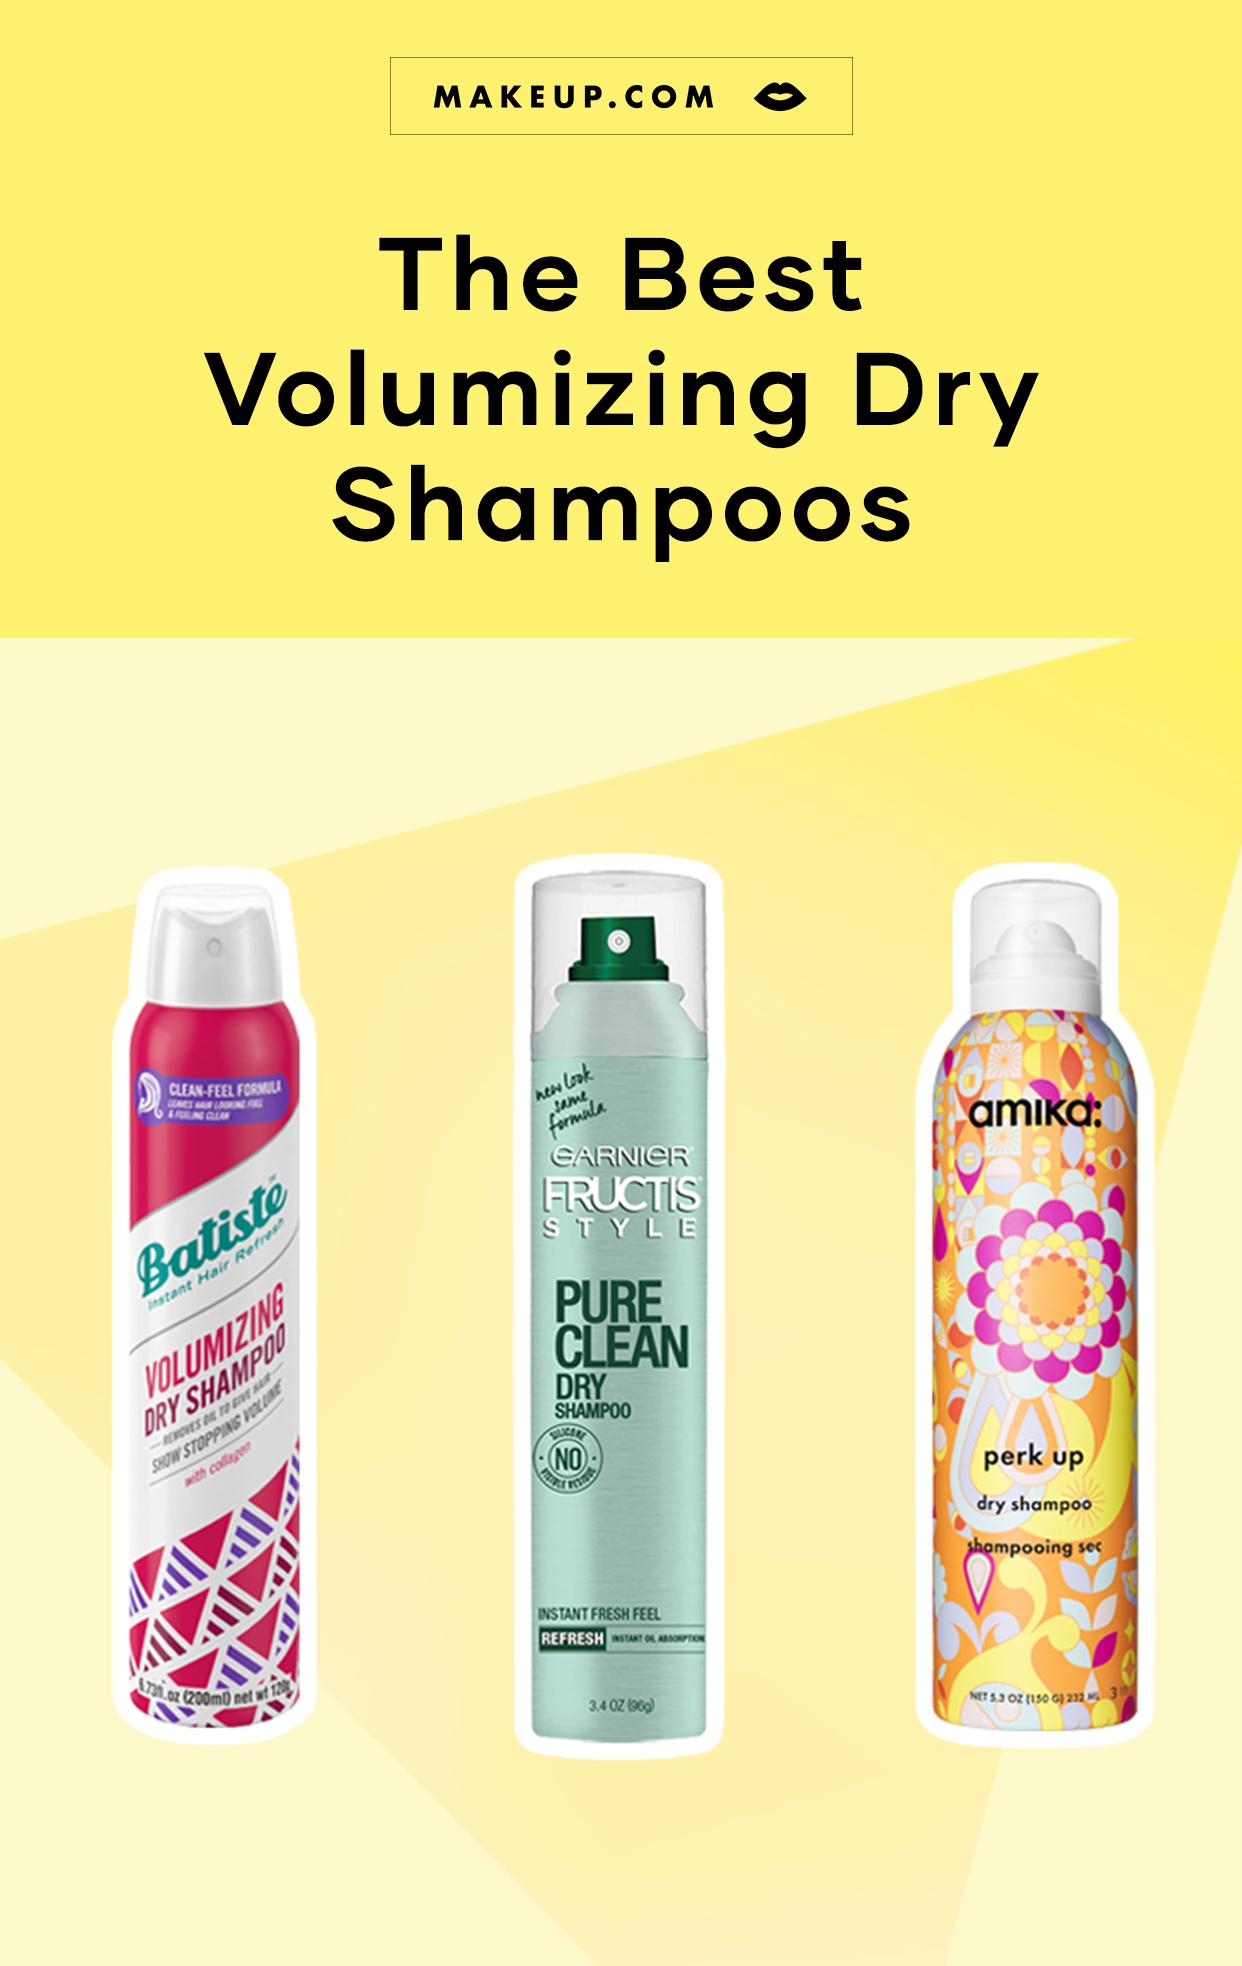 Best Volumizing Dry Shampoos Makeup Com By L Oreal Dry Shampoo Limp Hair Best Dry Shampoo